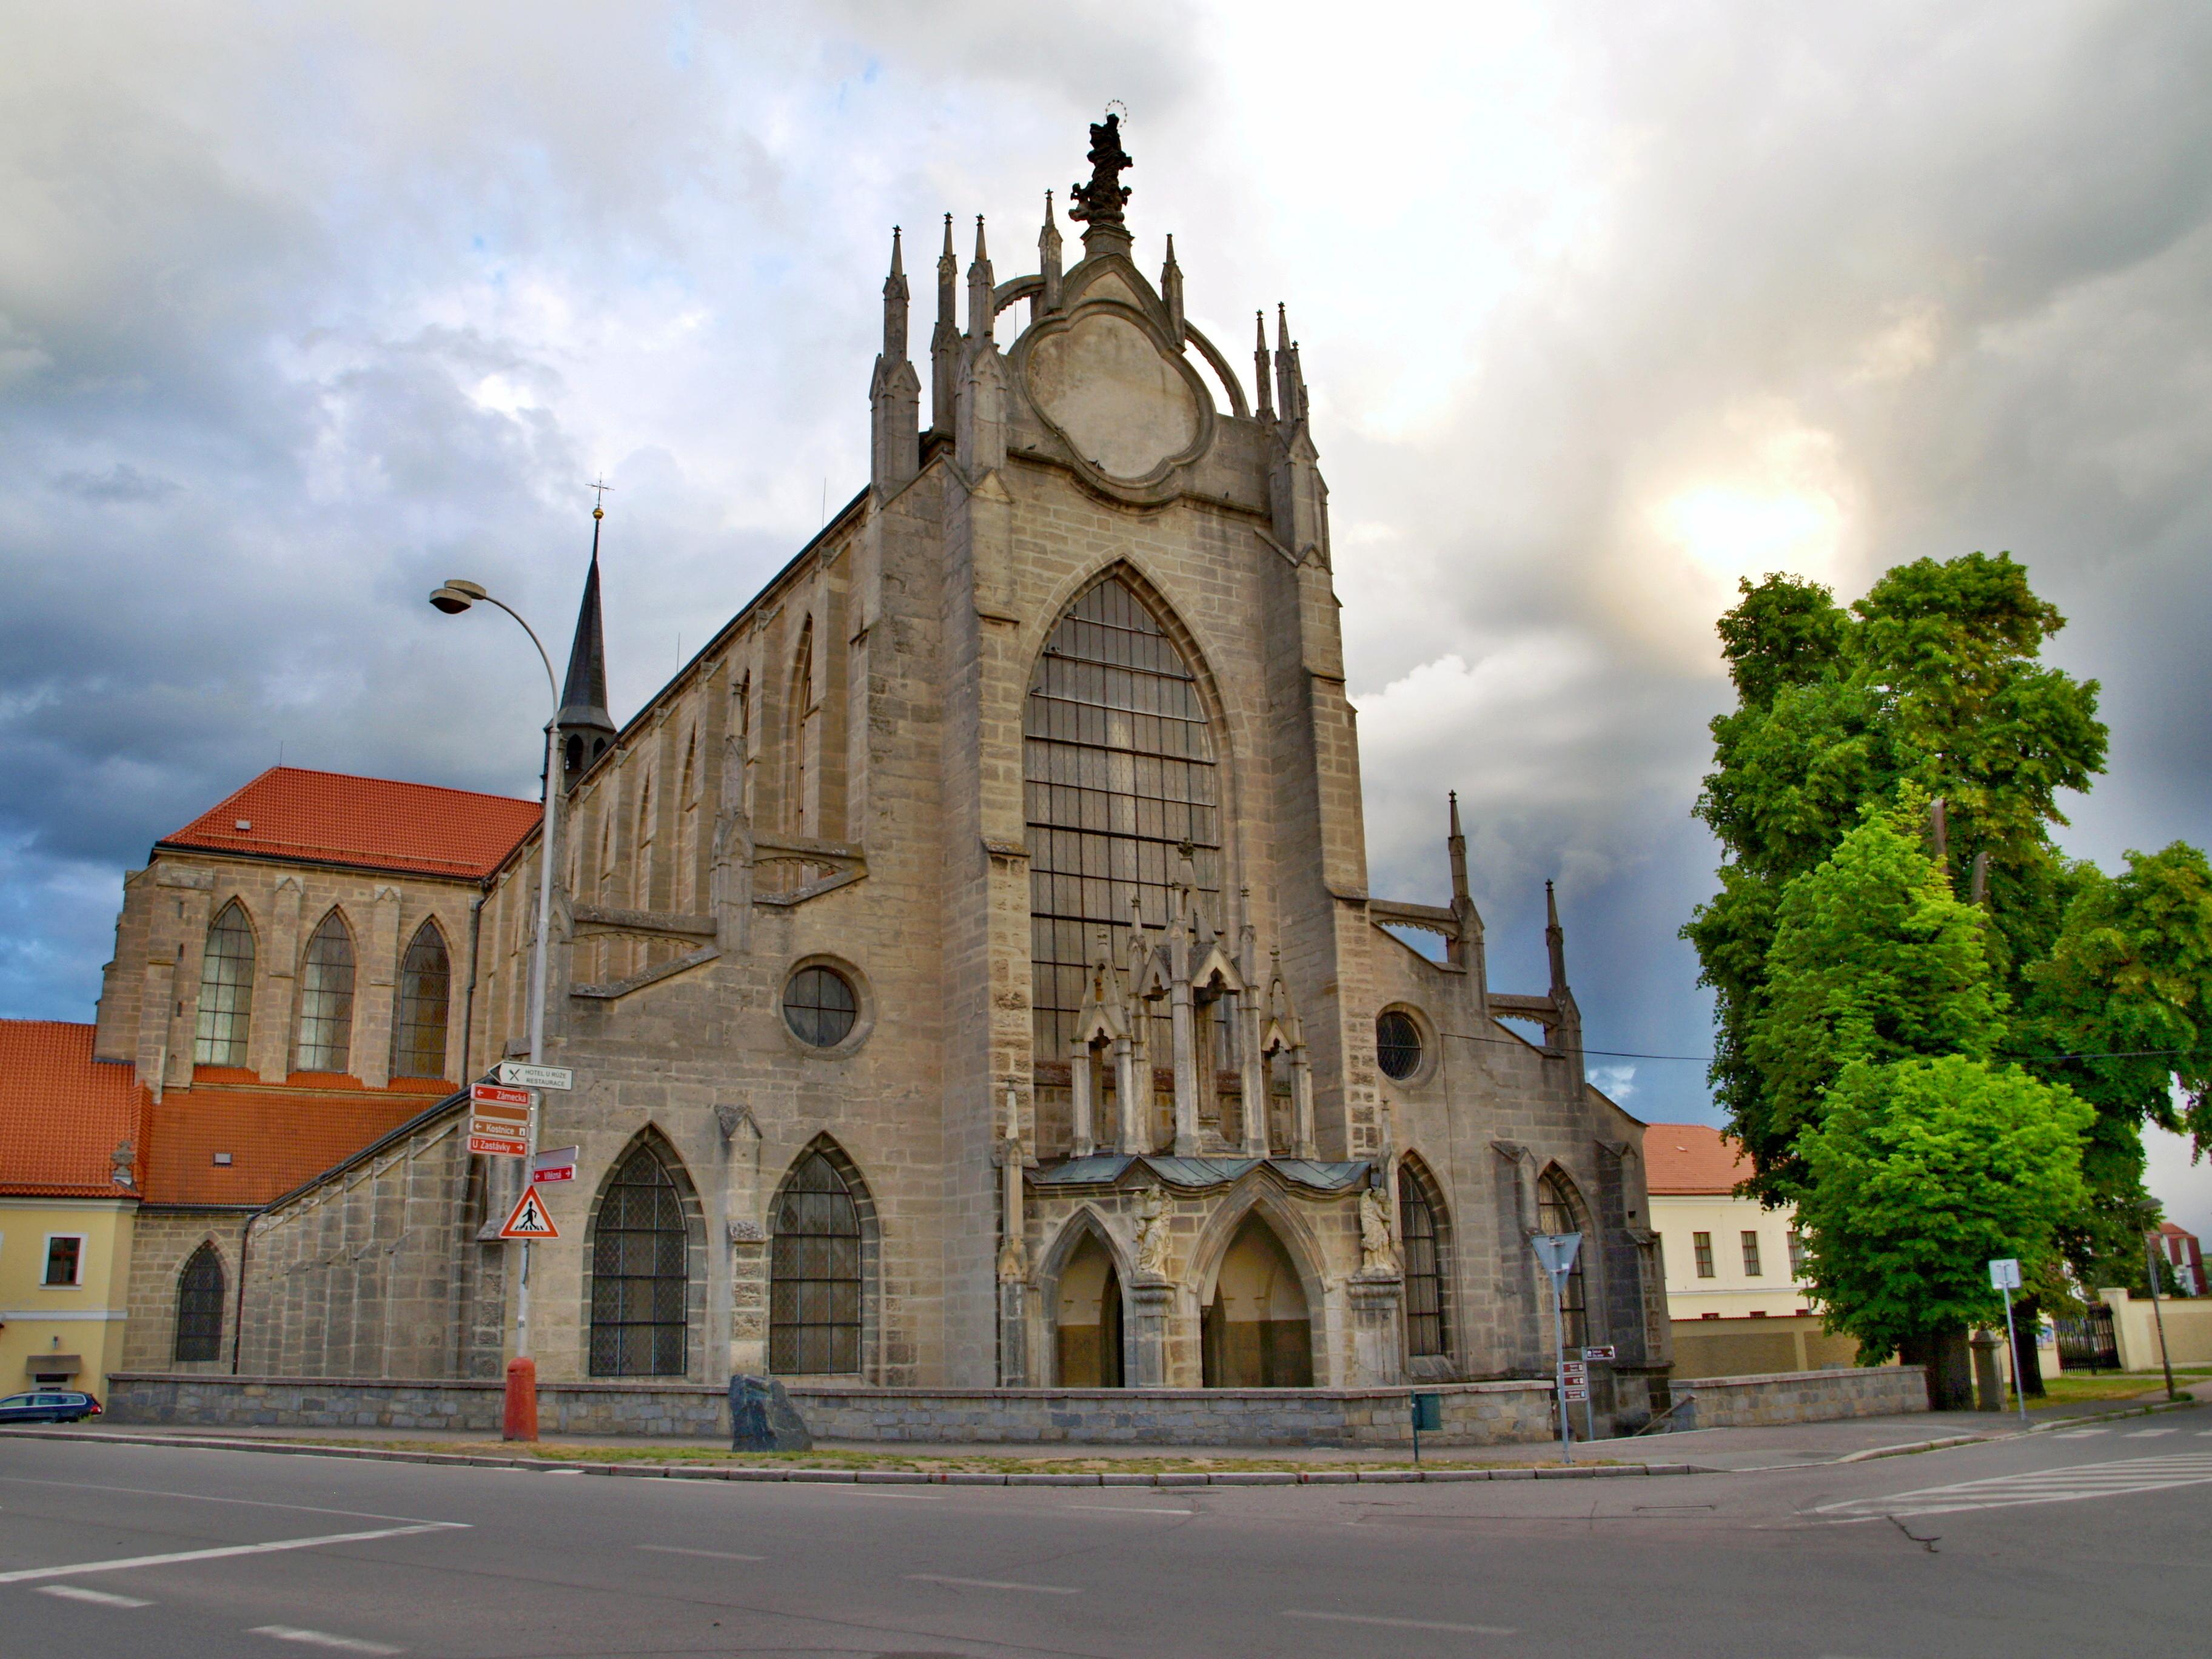 6781-katedrala-nanebevzeti-panny-marie-a-sv-jana-krtitele-cathedral-of-assumption-of-our-lady-and-st-john-the-baptist.jpg